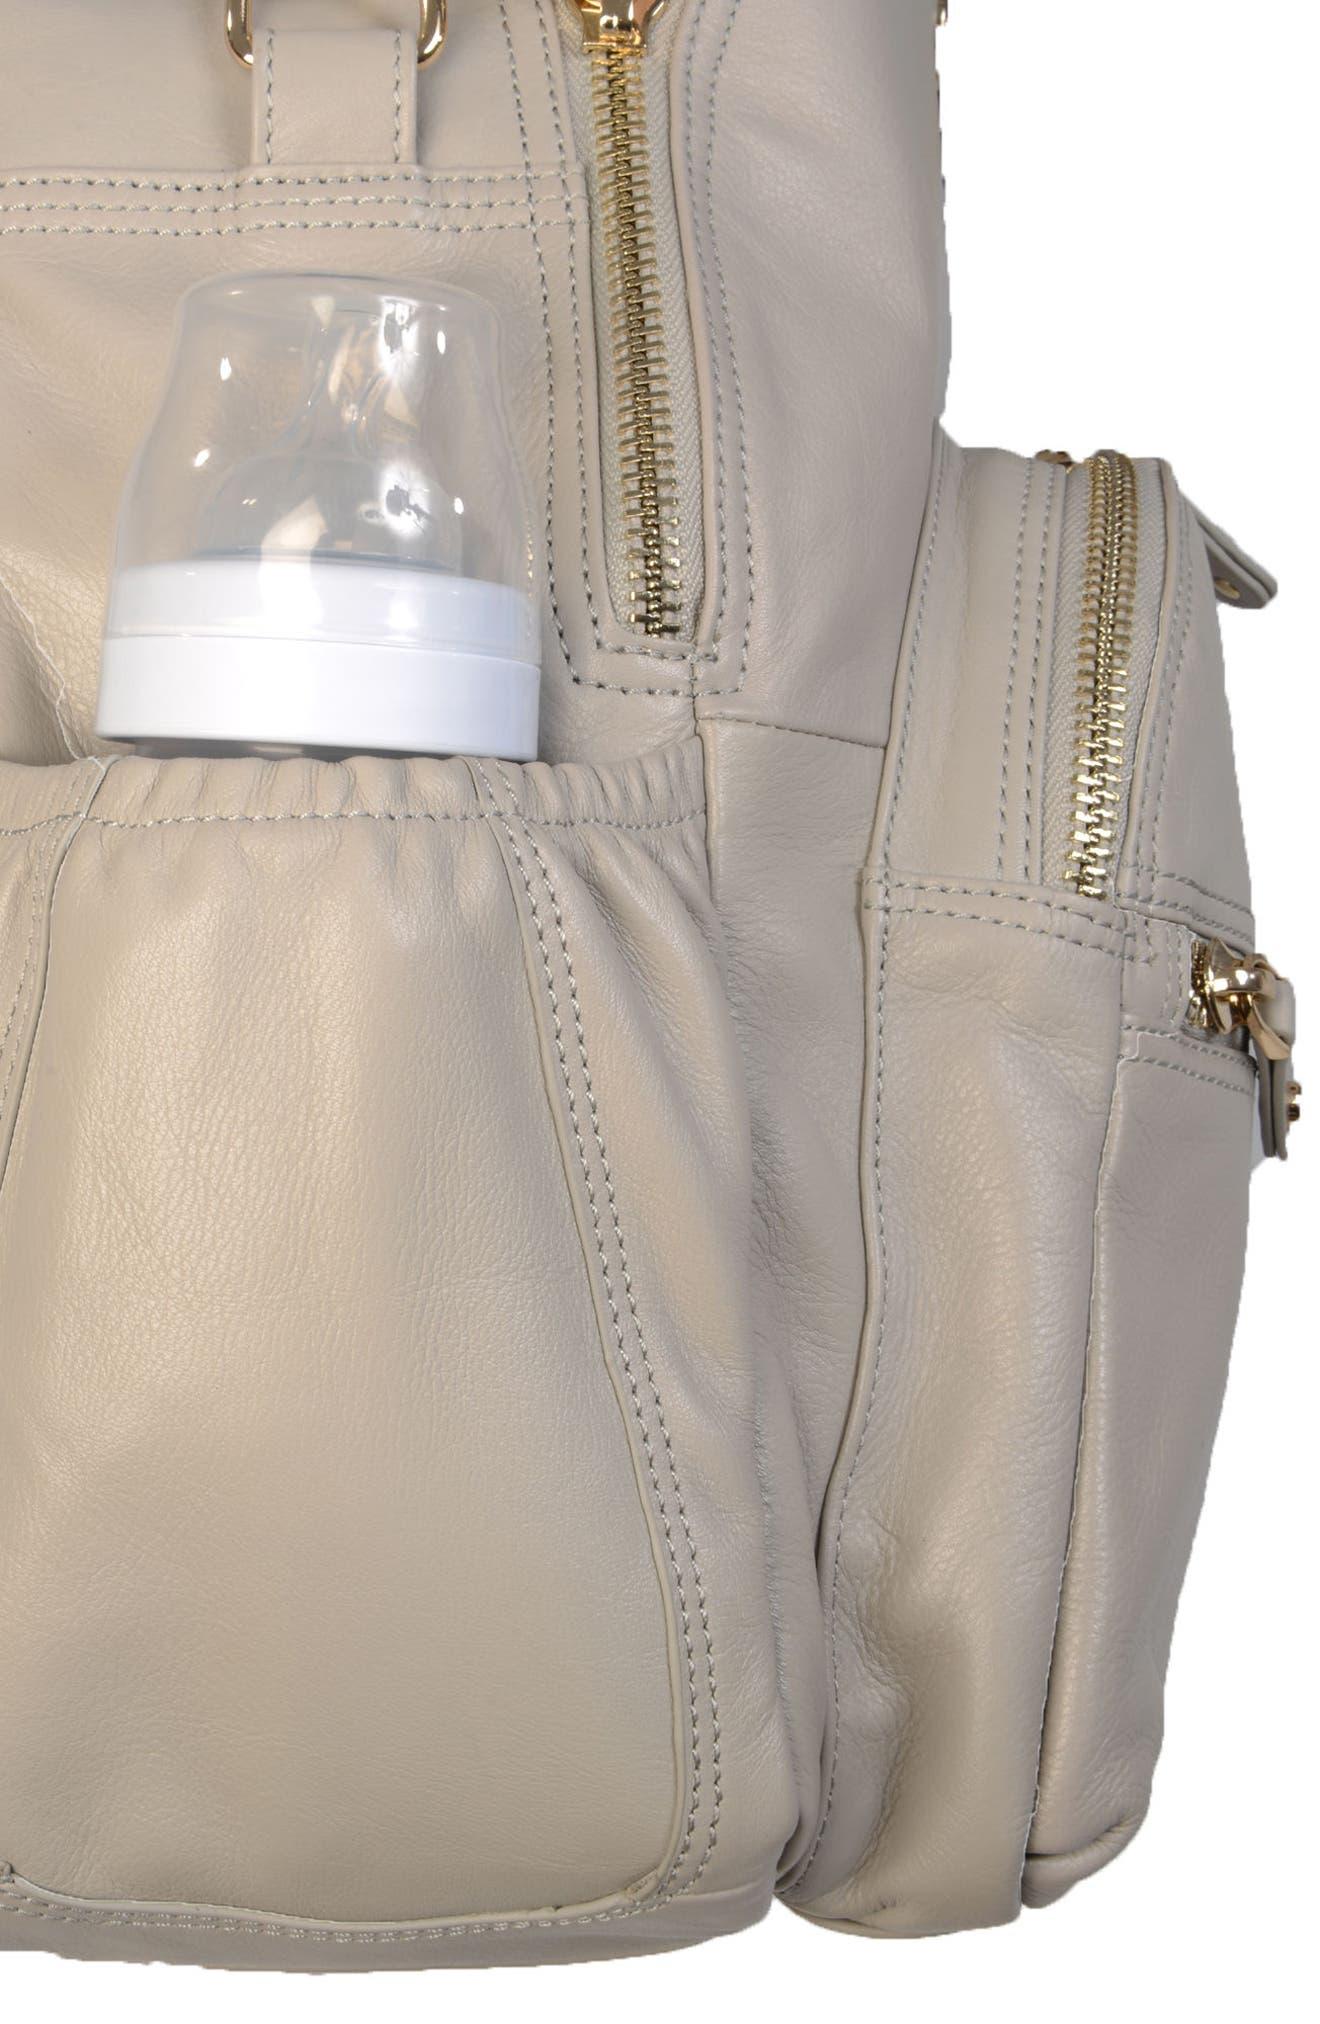 Joy XL Leather Backpack,                             Alternate thumbnail 17, color,                             Ice Grey